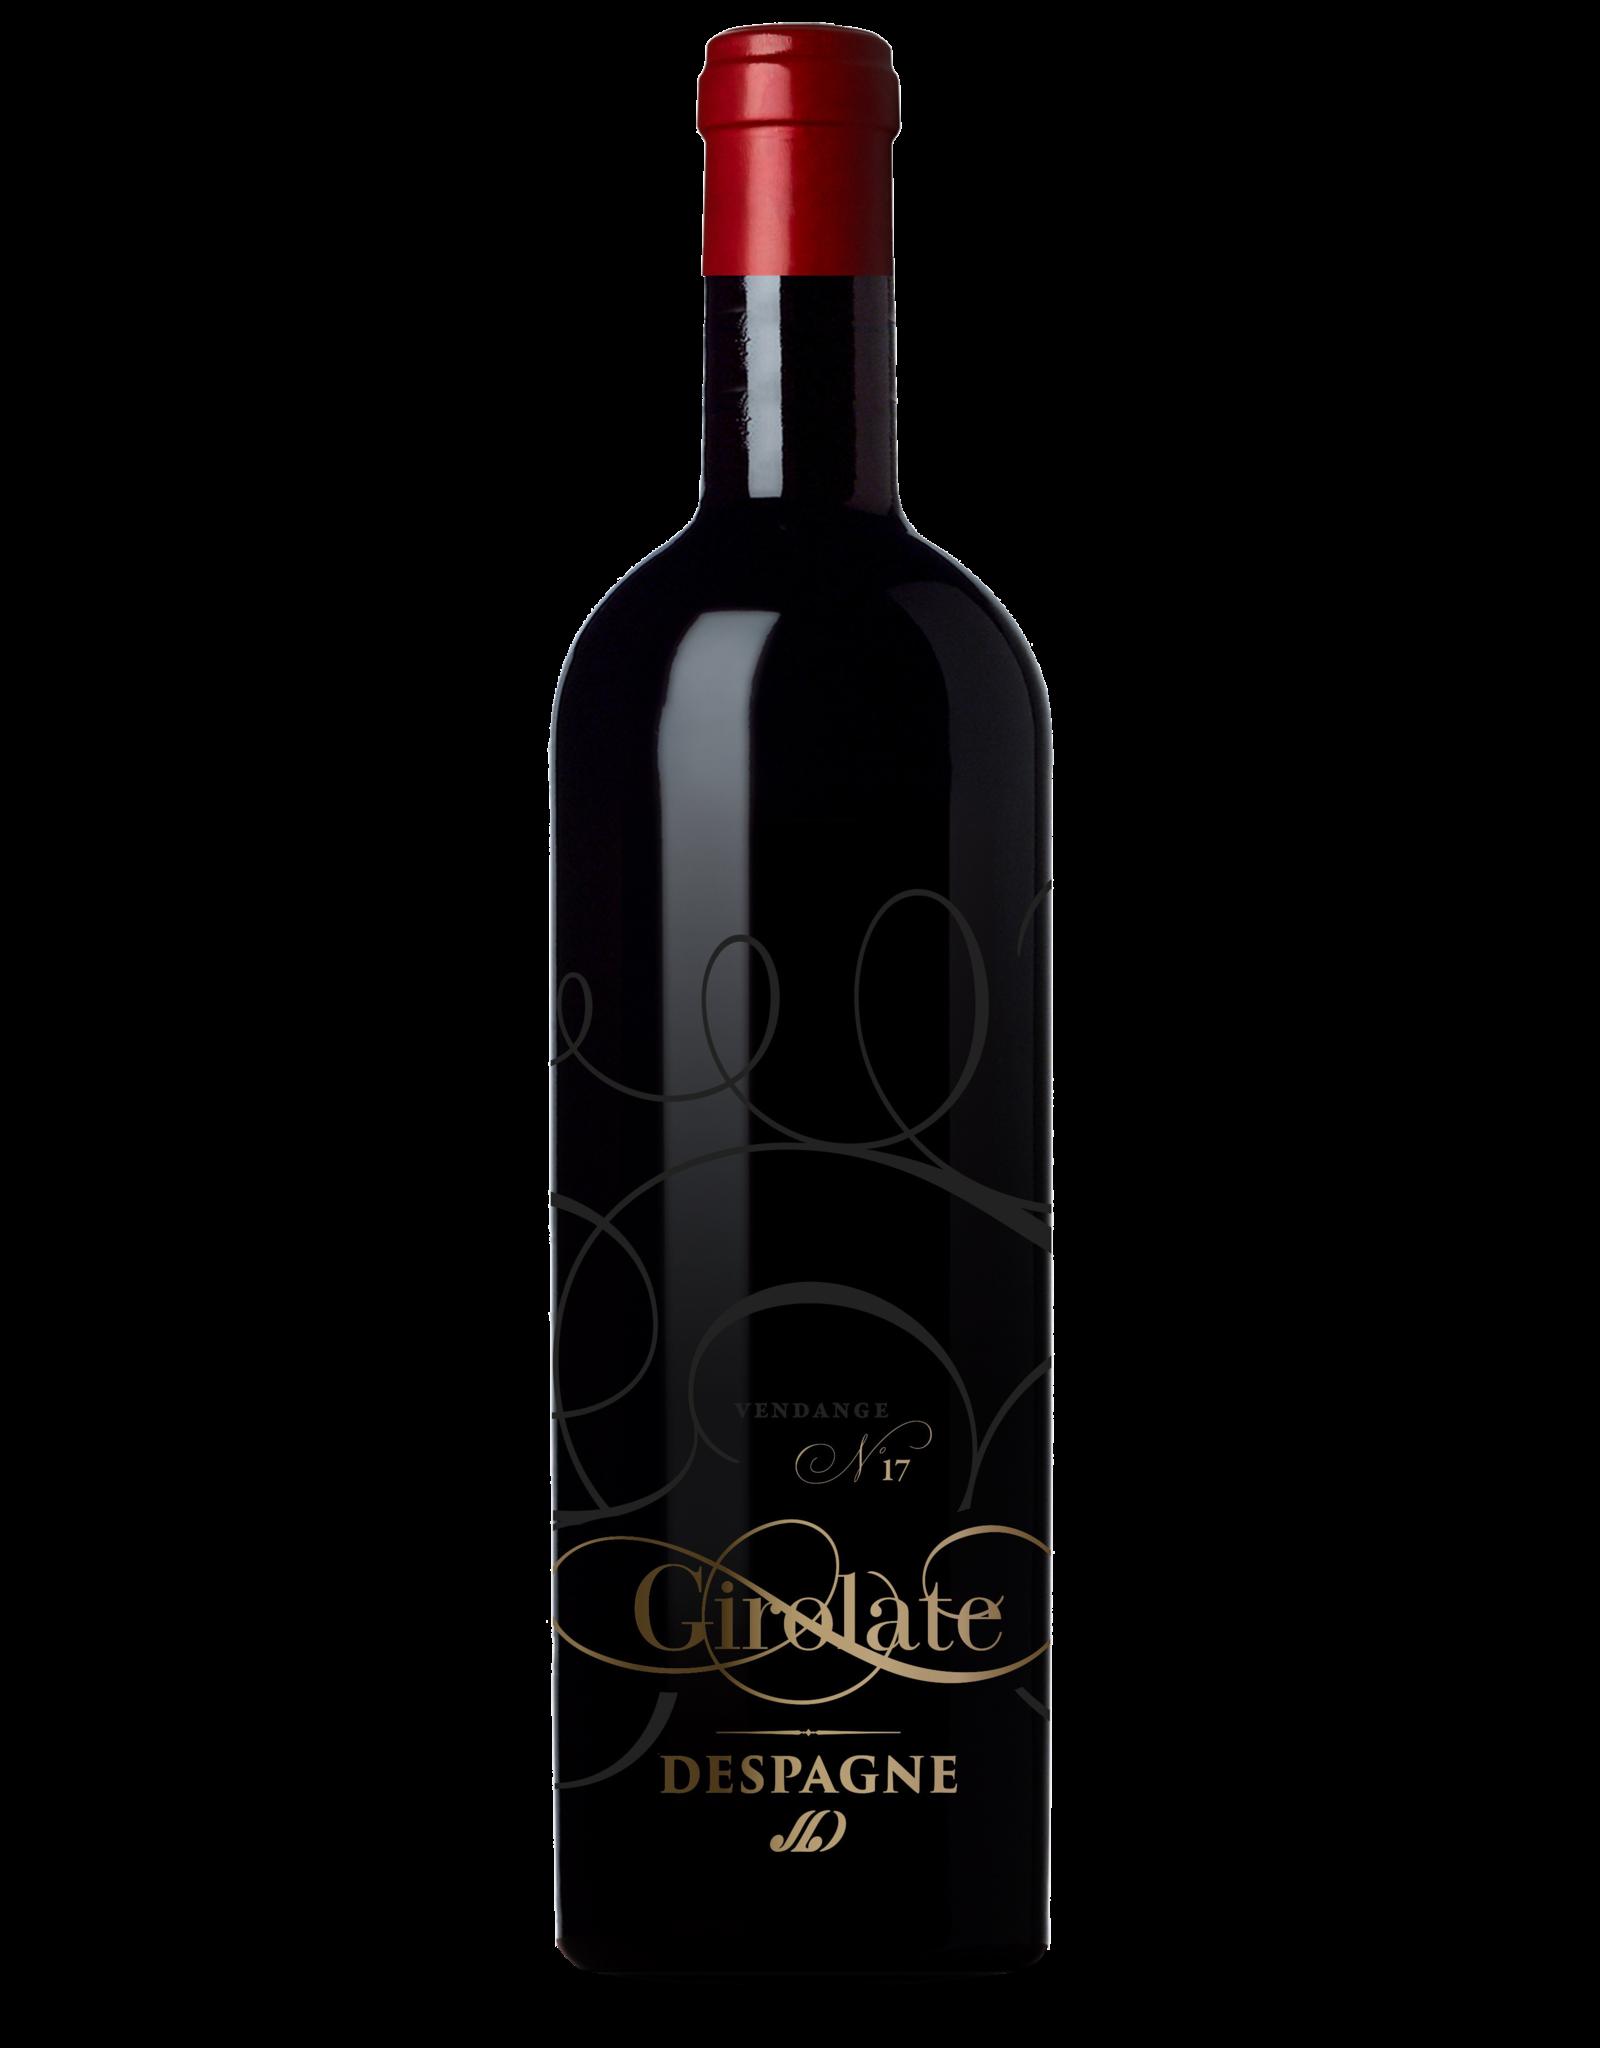 Château Rauzan Despagne Girolate Rouge 2016 - Bordeaux